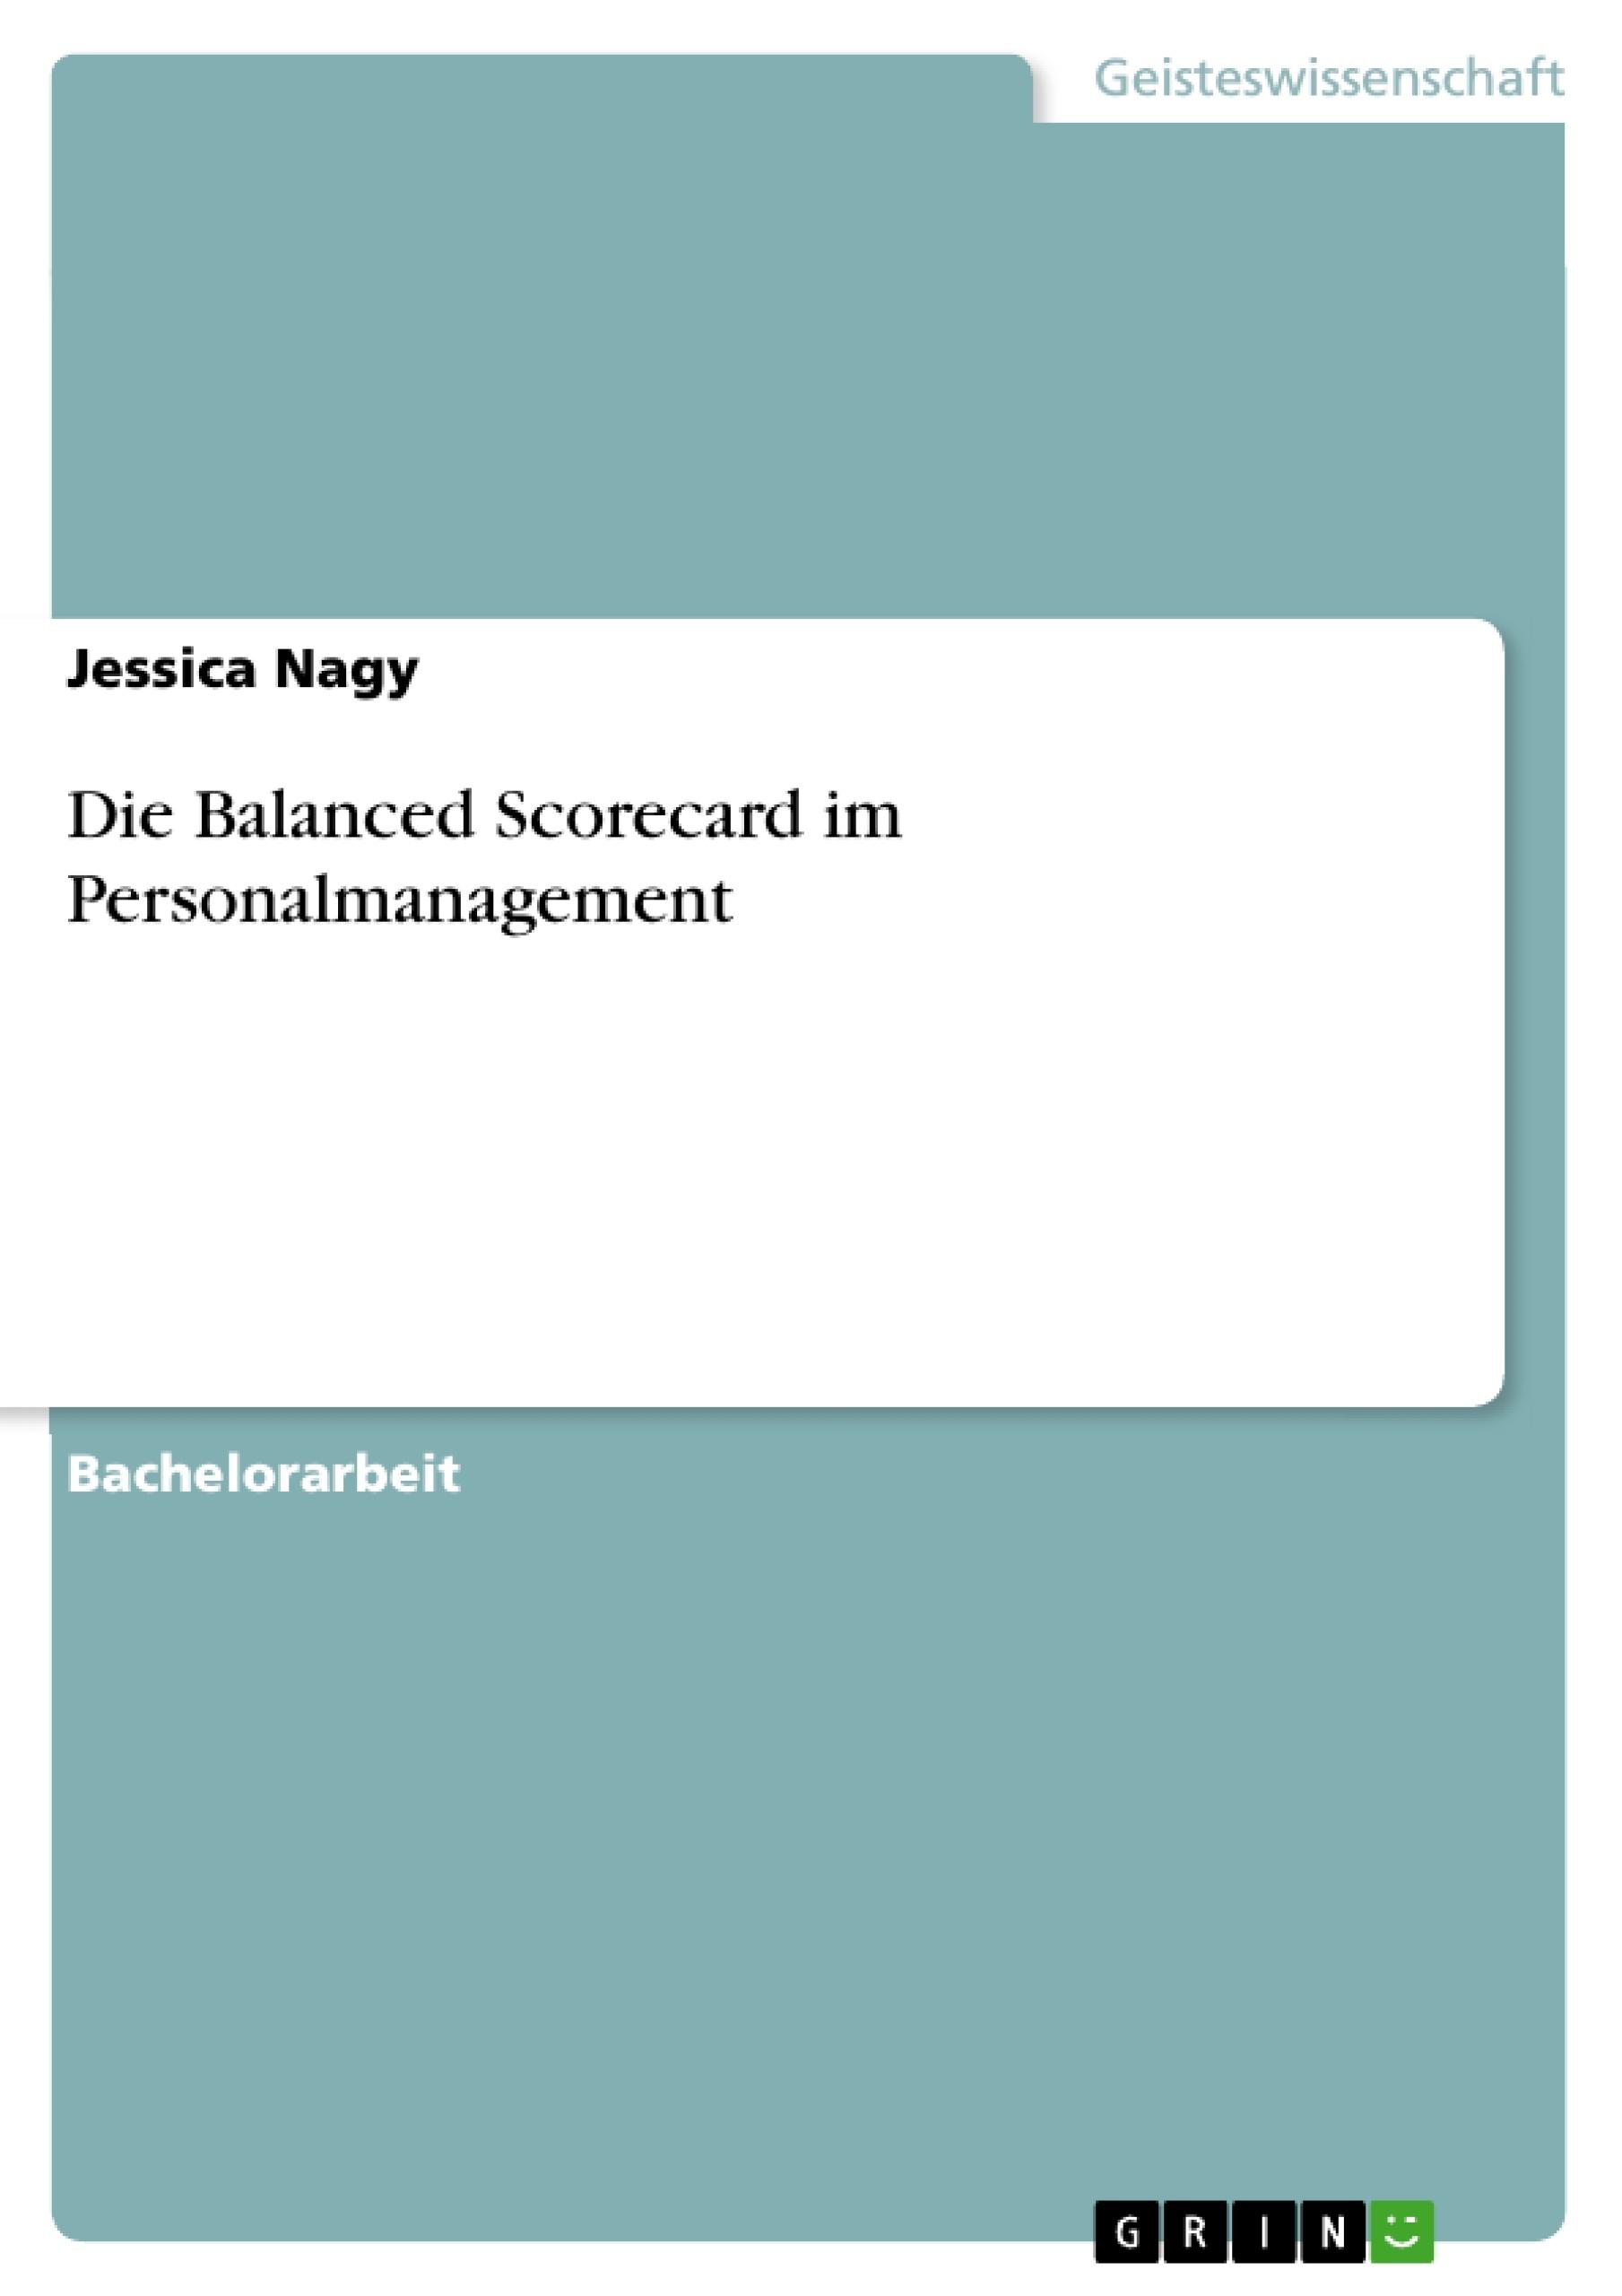 Personalmanagement bachelorarbeit hausarbeit 55104